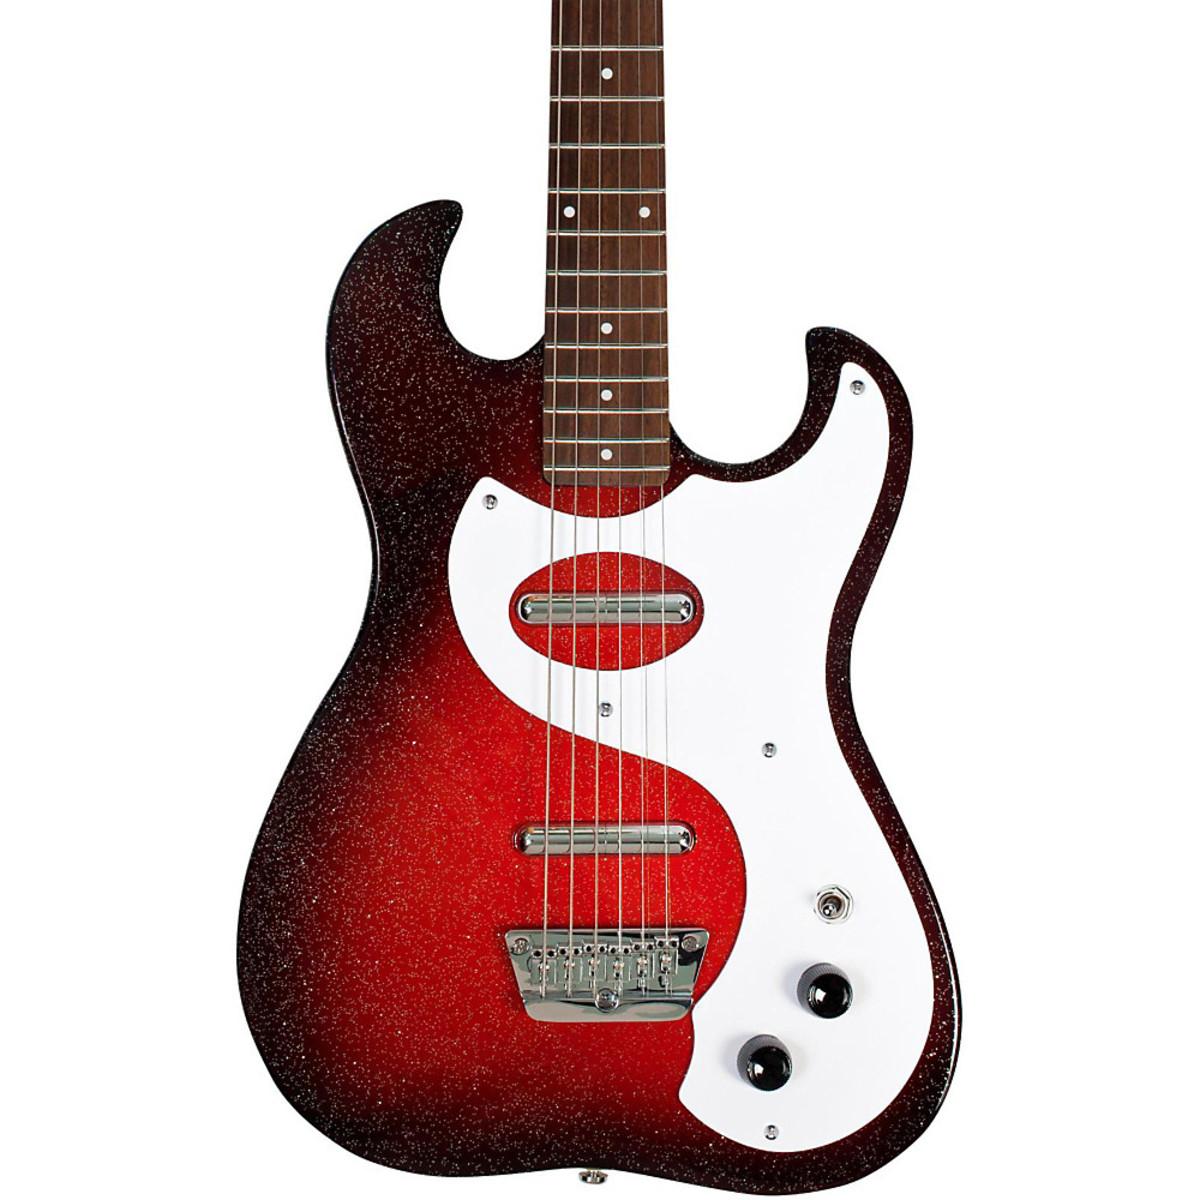 danelectro 63 double cutaway electric guitar red sparkle burst at. Black Bedroom Furniture Sets. Home Design Ideas